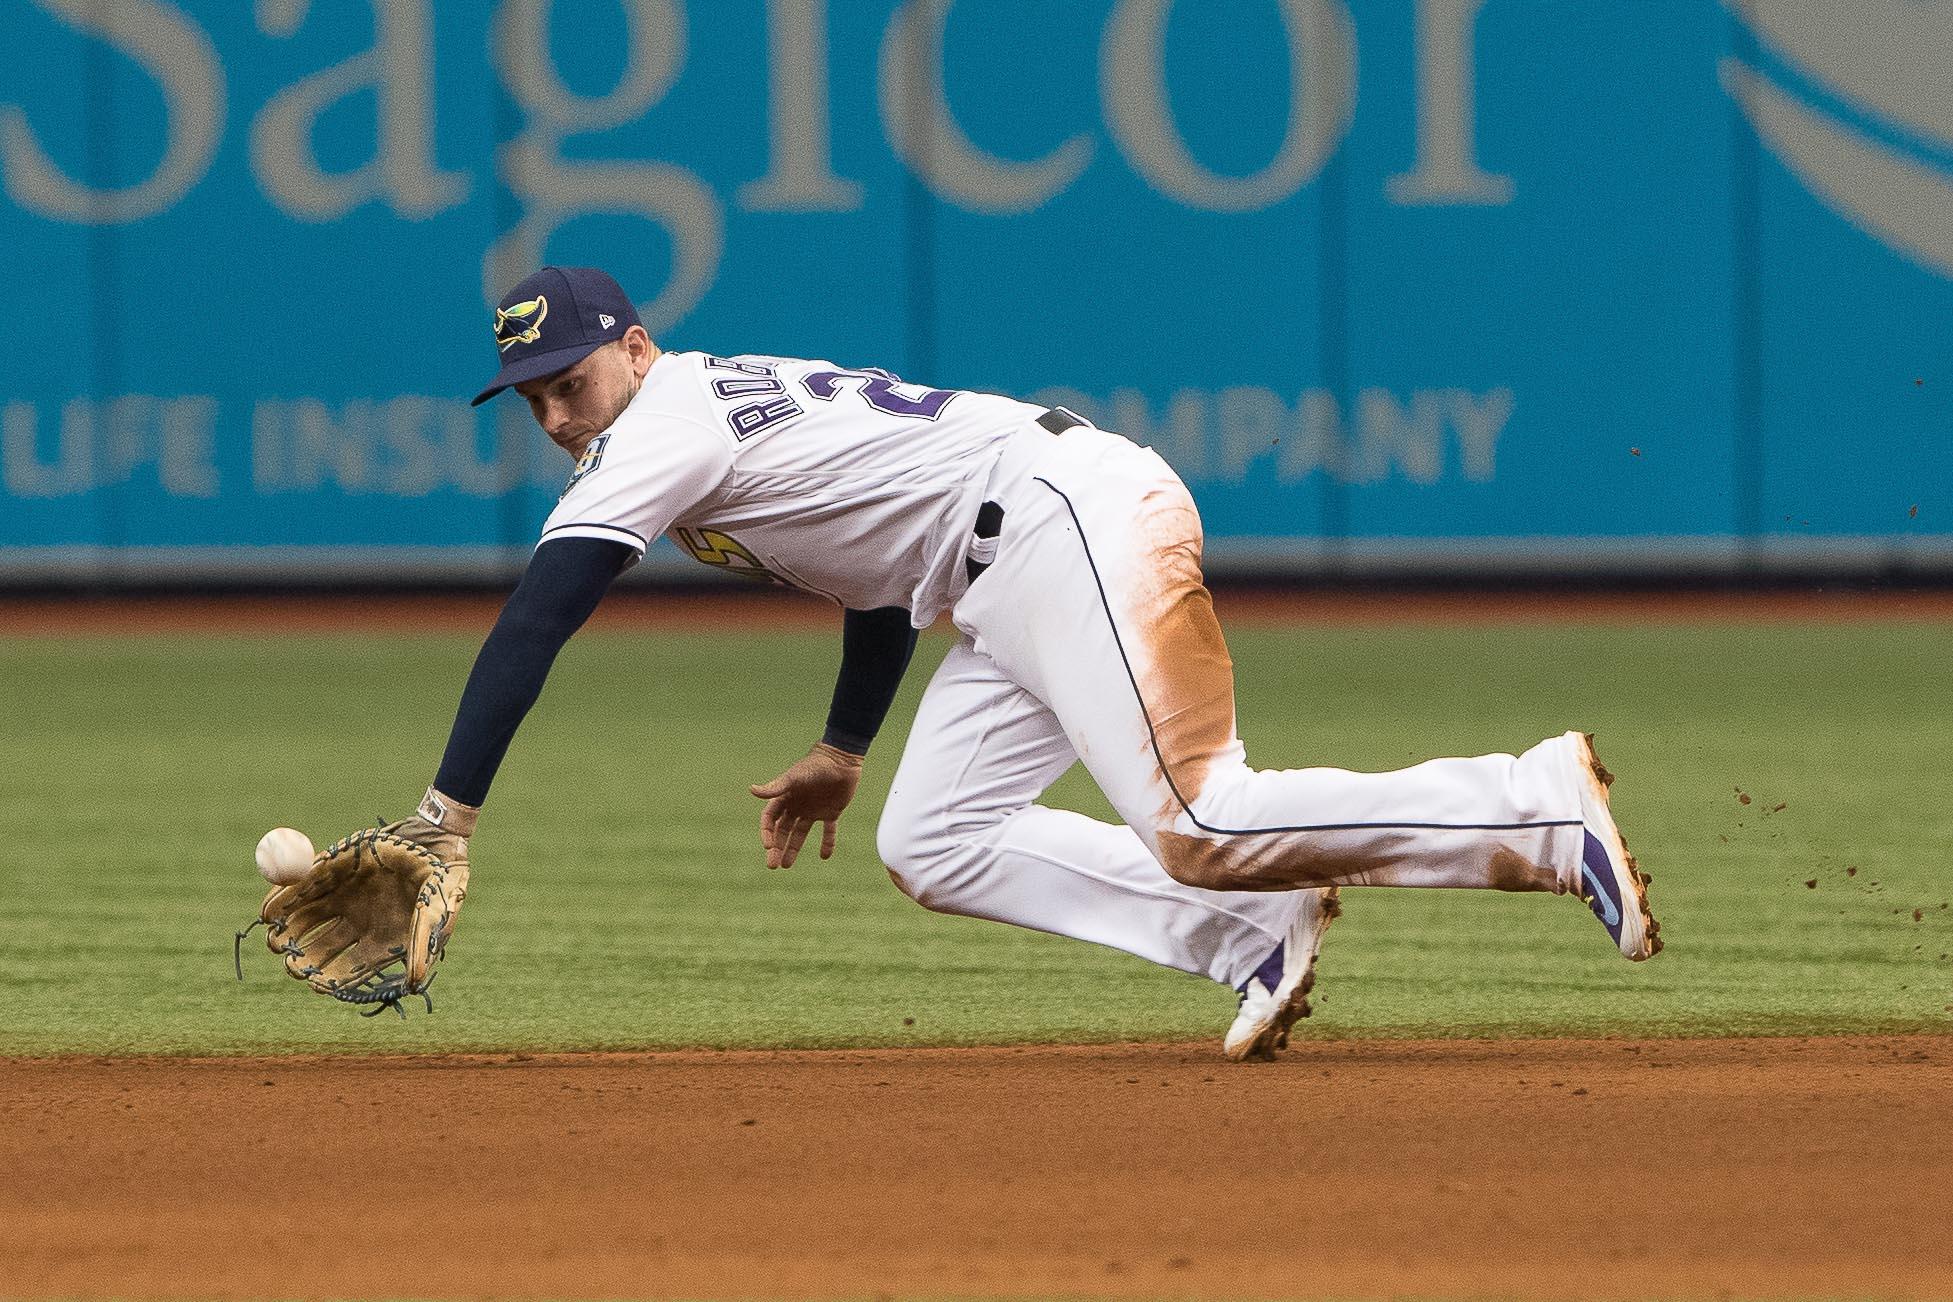 Daniel Robertson gets low for the catch./STEVEN MUNCIE